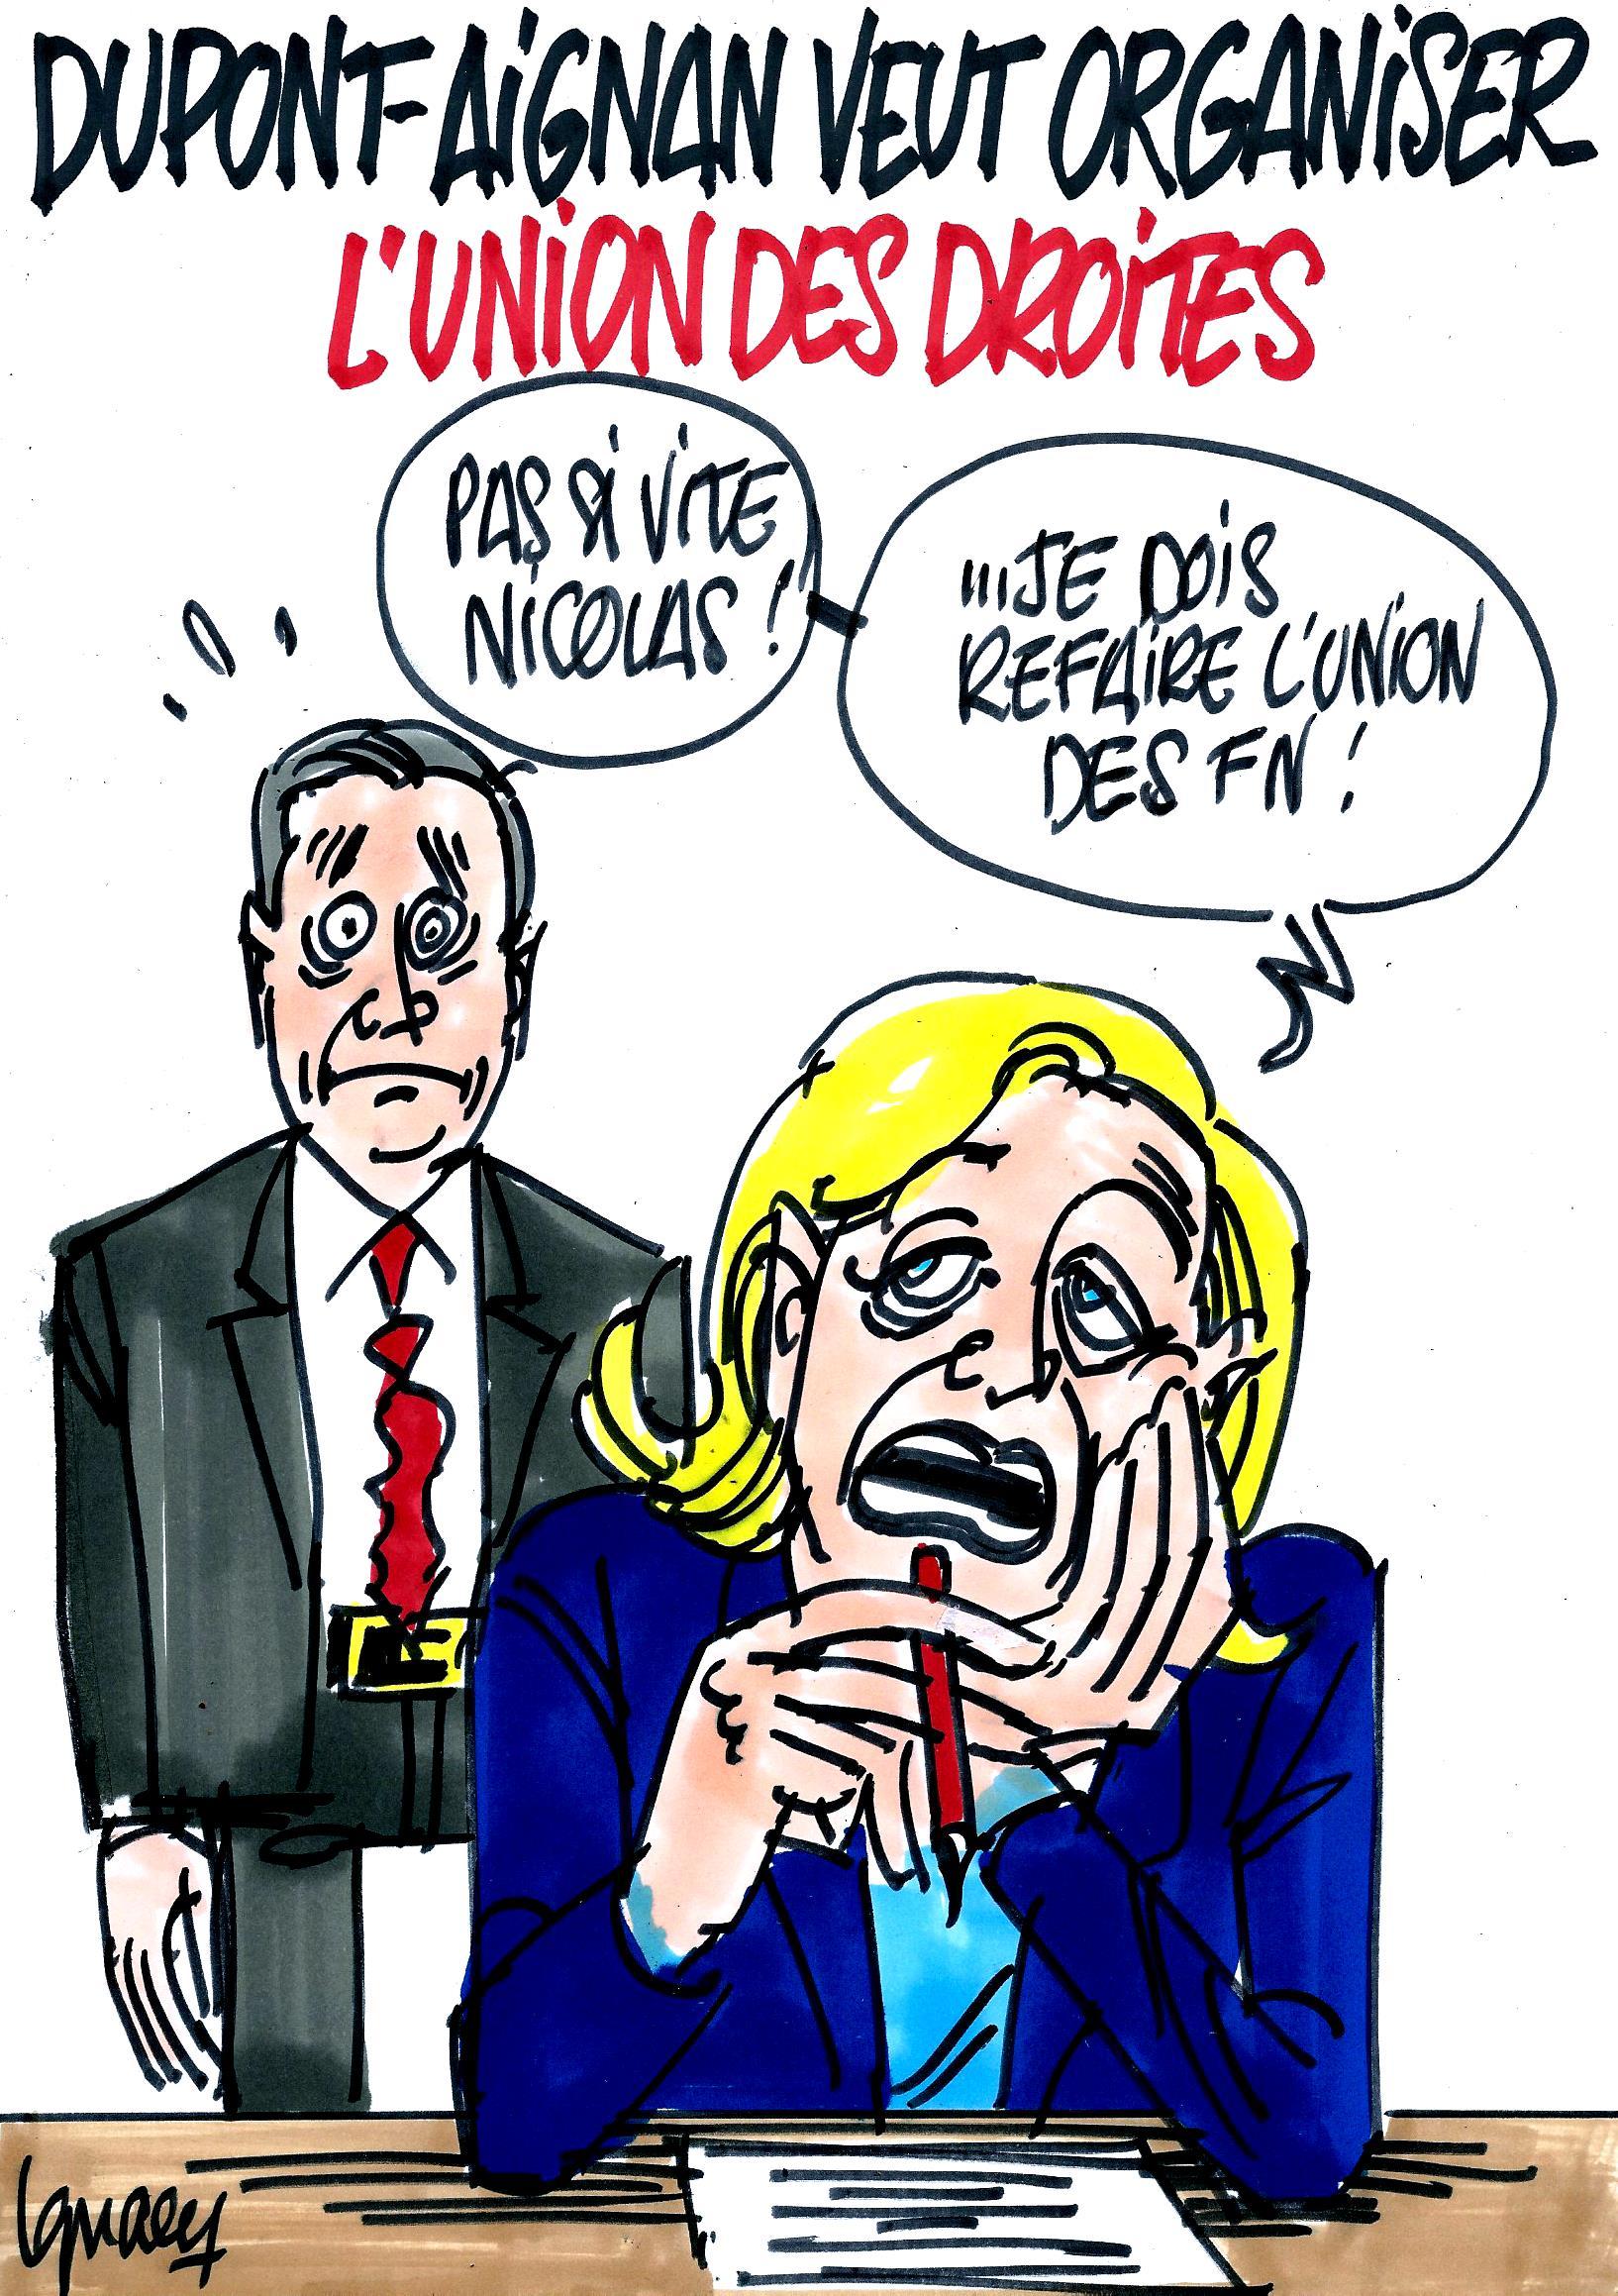 ignace_philippot_le_pen_fn_dupont_aignan_union_des_droites-mpi.jpg